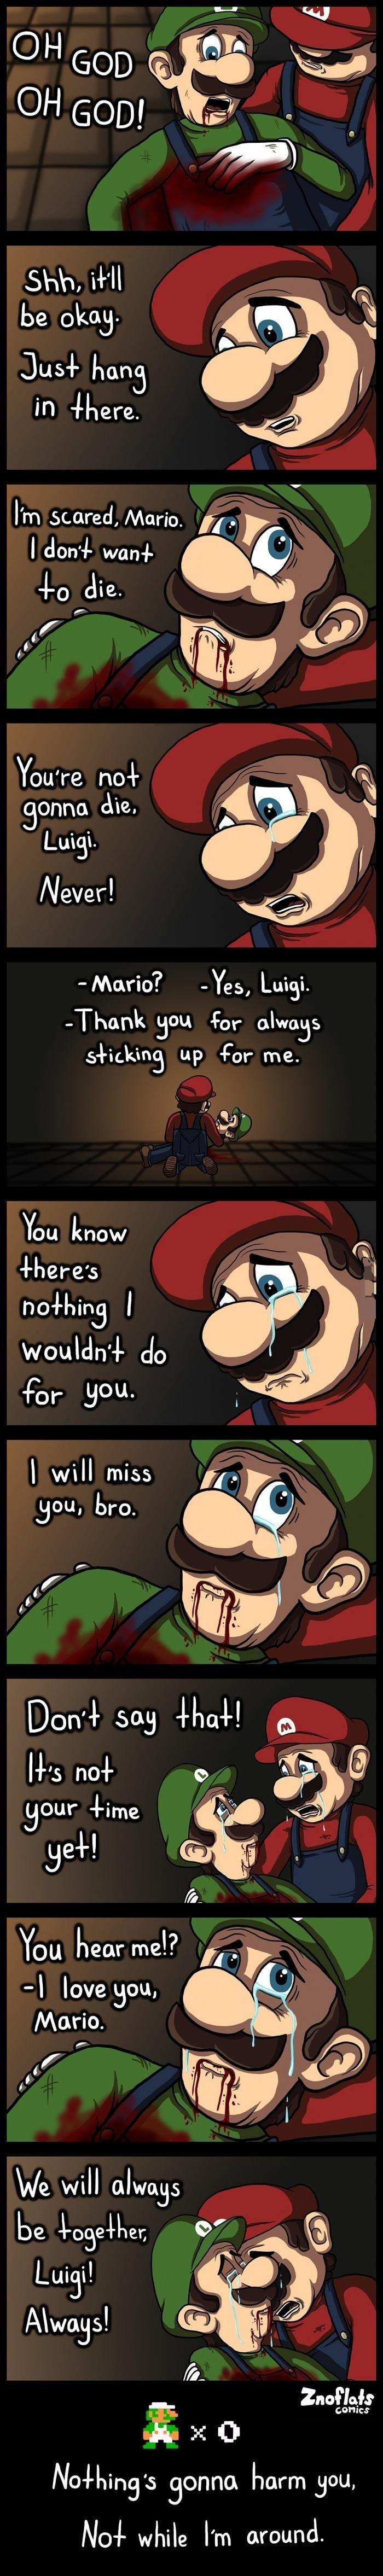 The Love Story Between Mario and Luigi